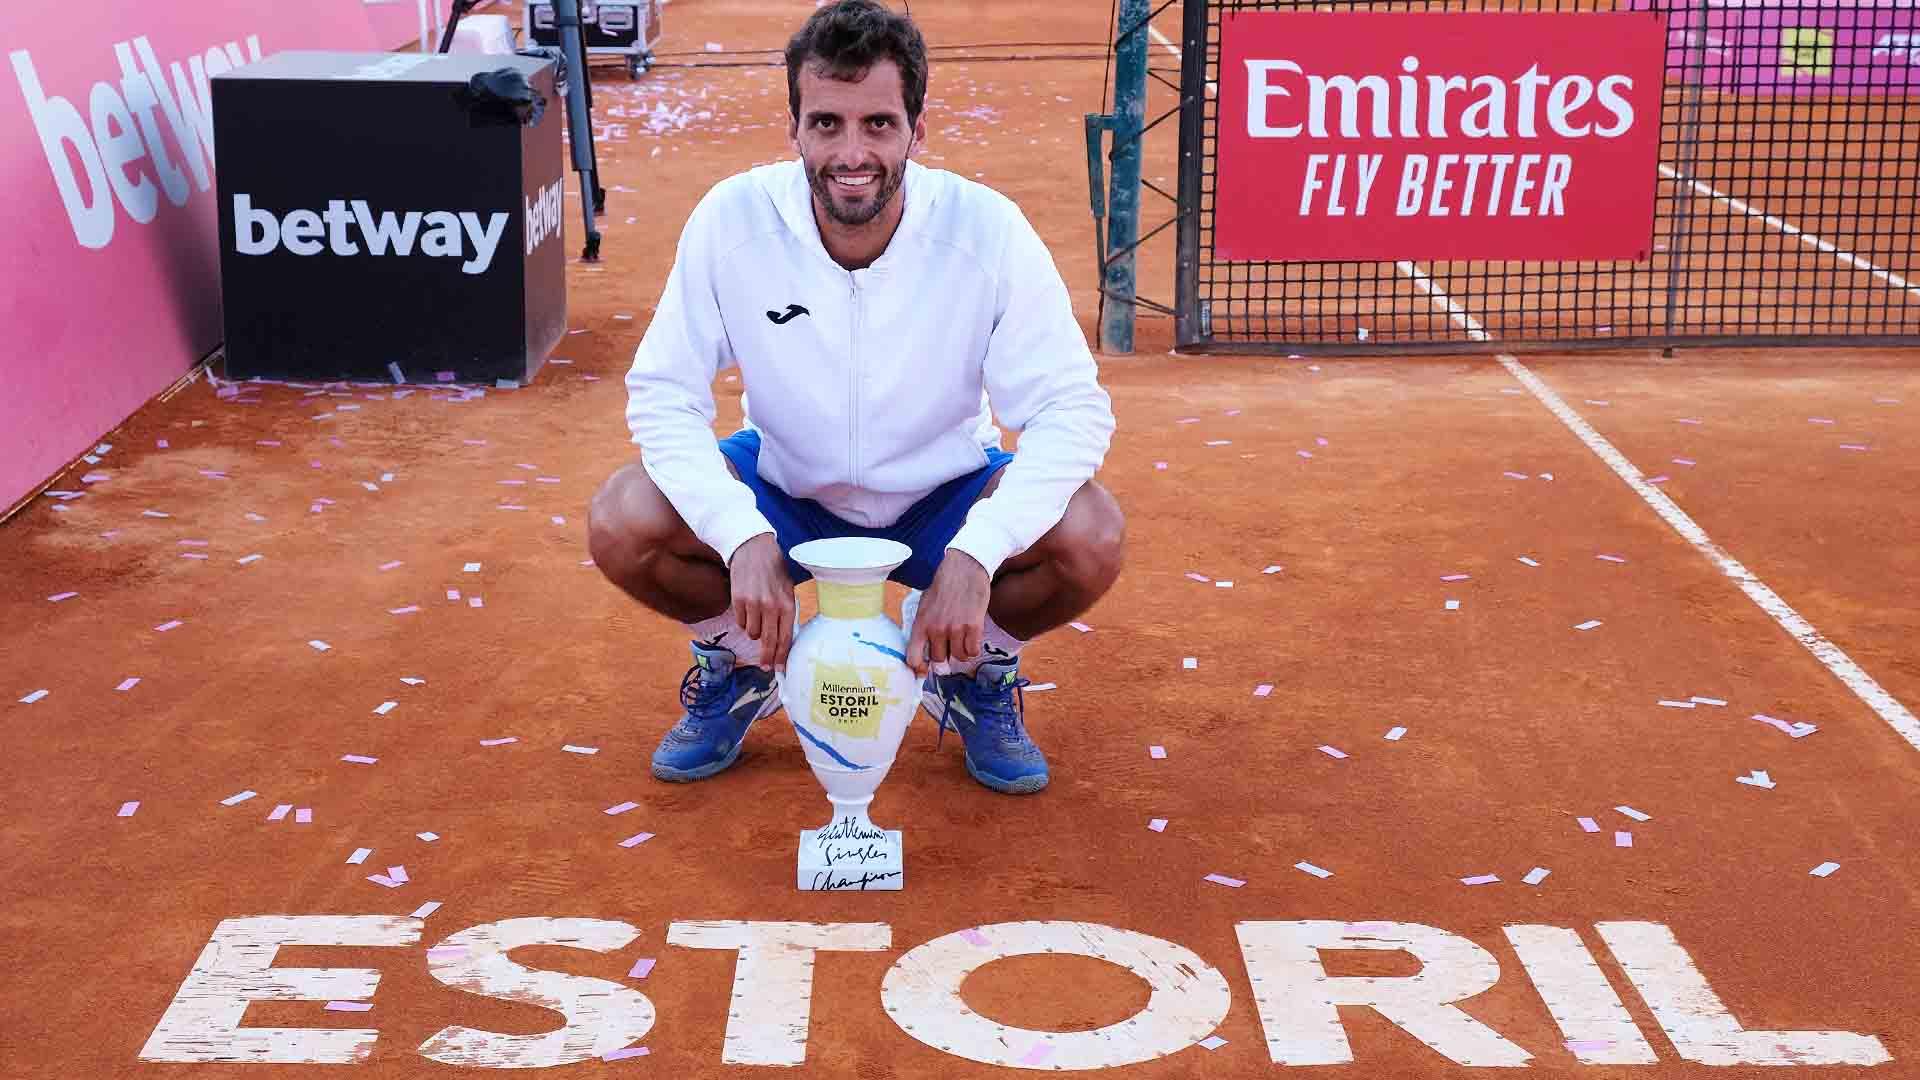 ramos vinolas estoril 2021 sunday trophy - Albert Ramos Vinolas najboljši v Estorilu